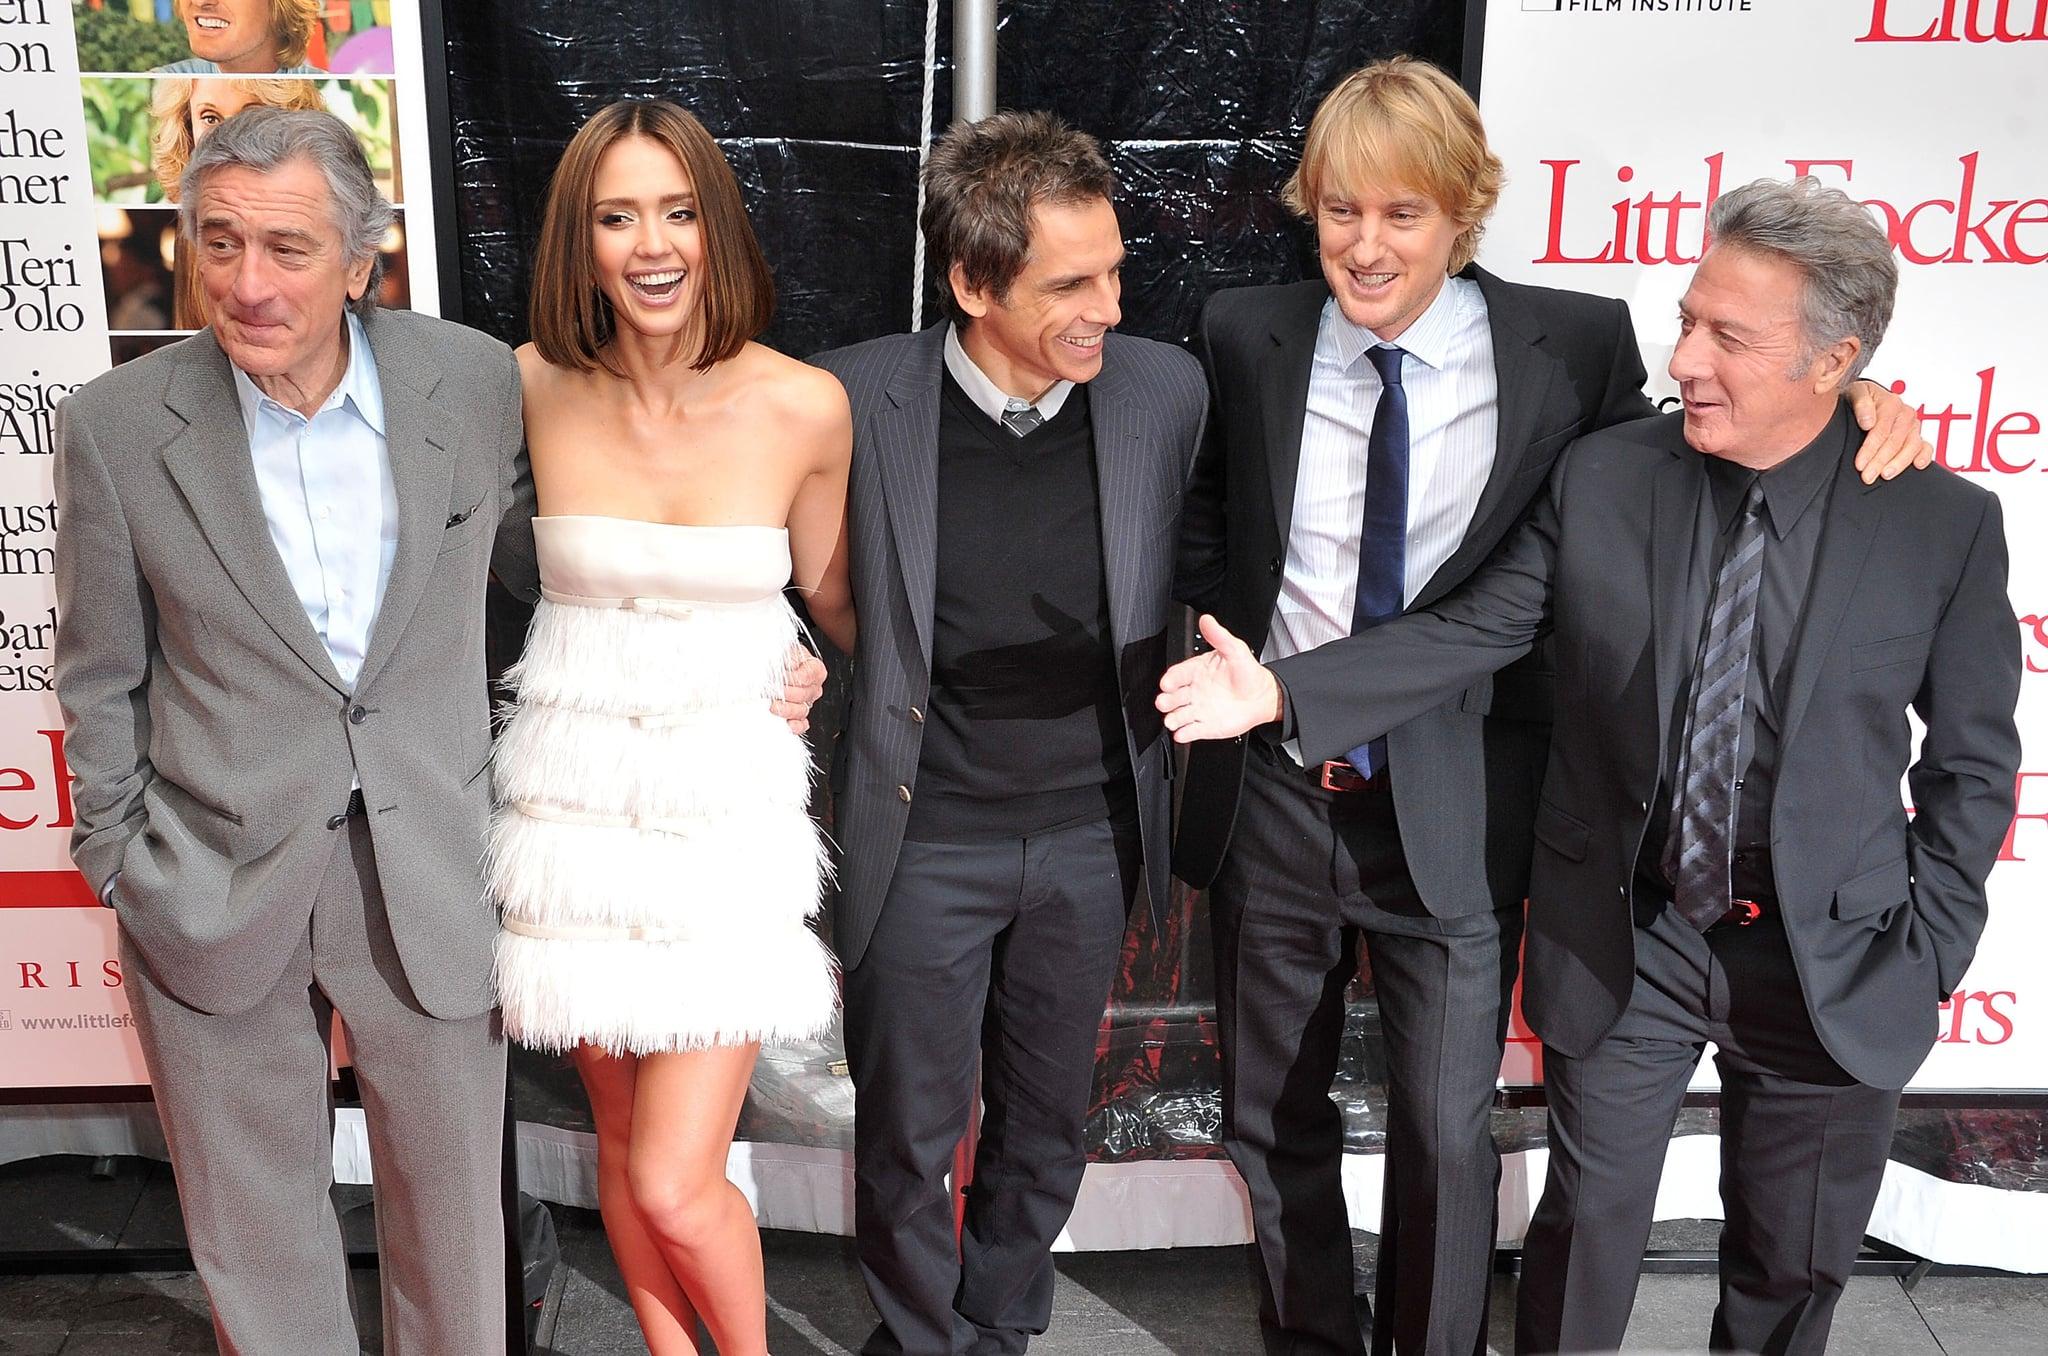 Pictures Of Jessica Alba Owen Wilson Ben Stiller Robert De Niro And Dustin Hoffman At The Premiere Of Little Fockers 2010 12 16 08 45 00 Popsugar Celebrity